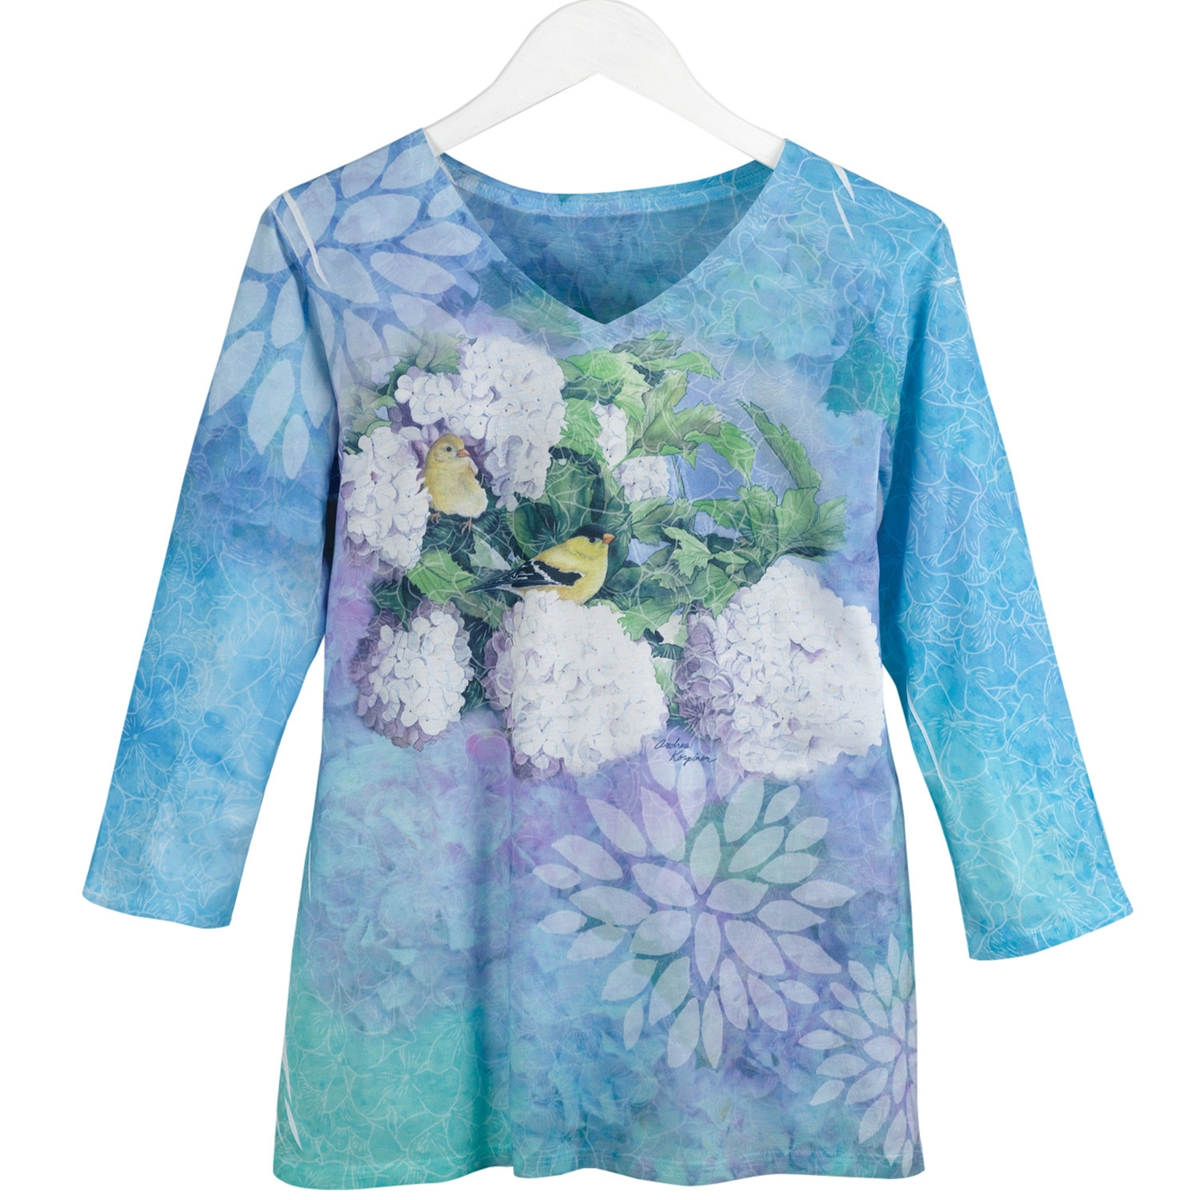 Hydrangea Spring Floral Tee